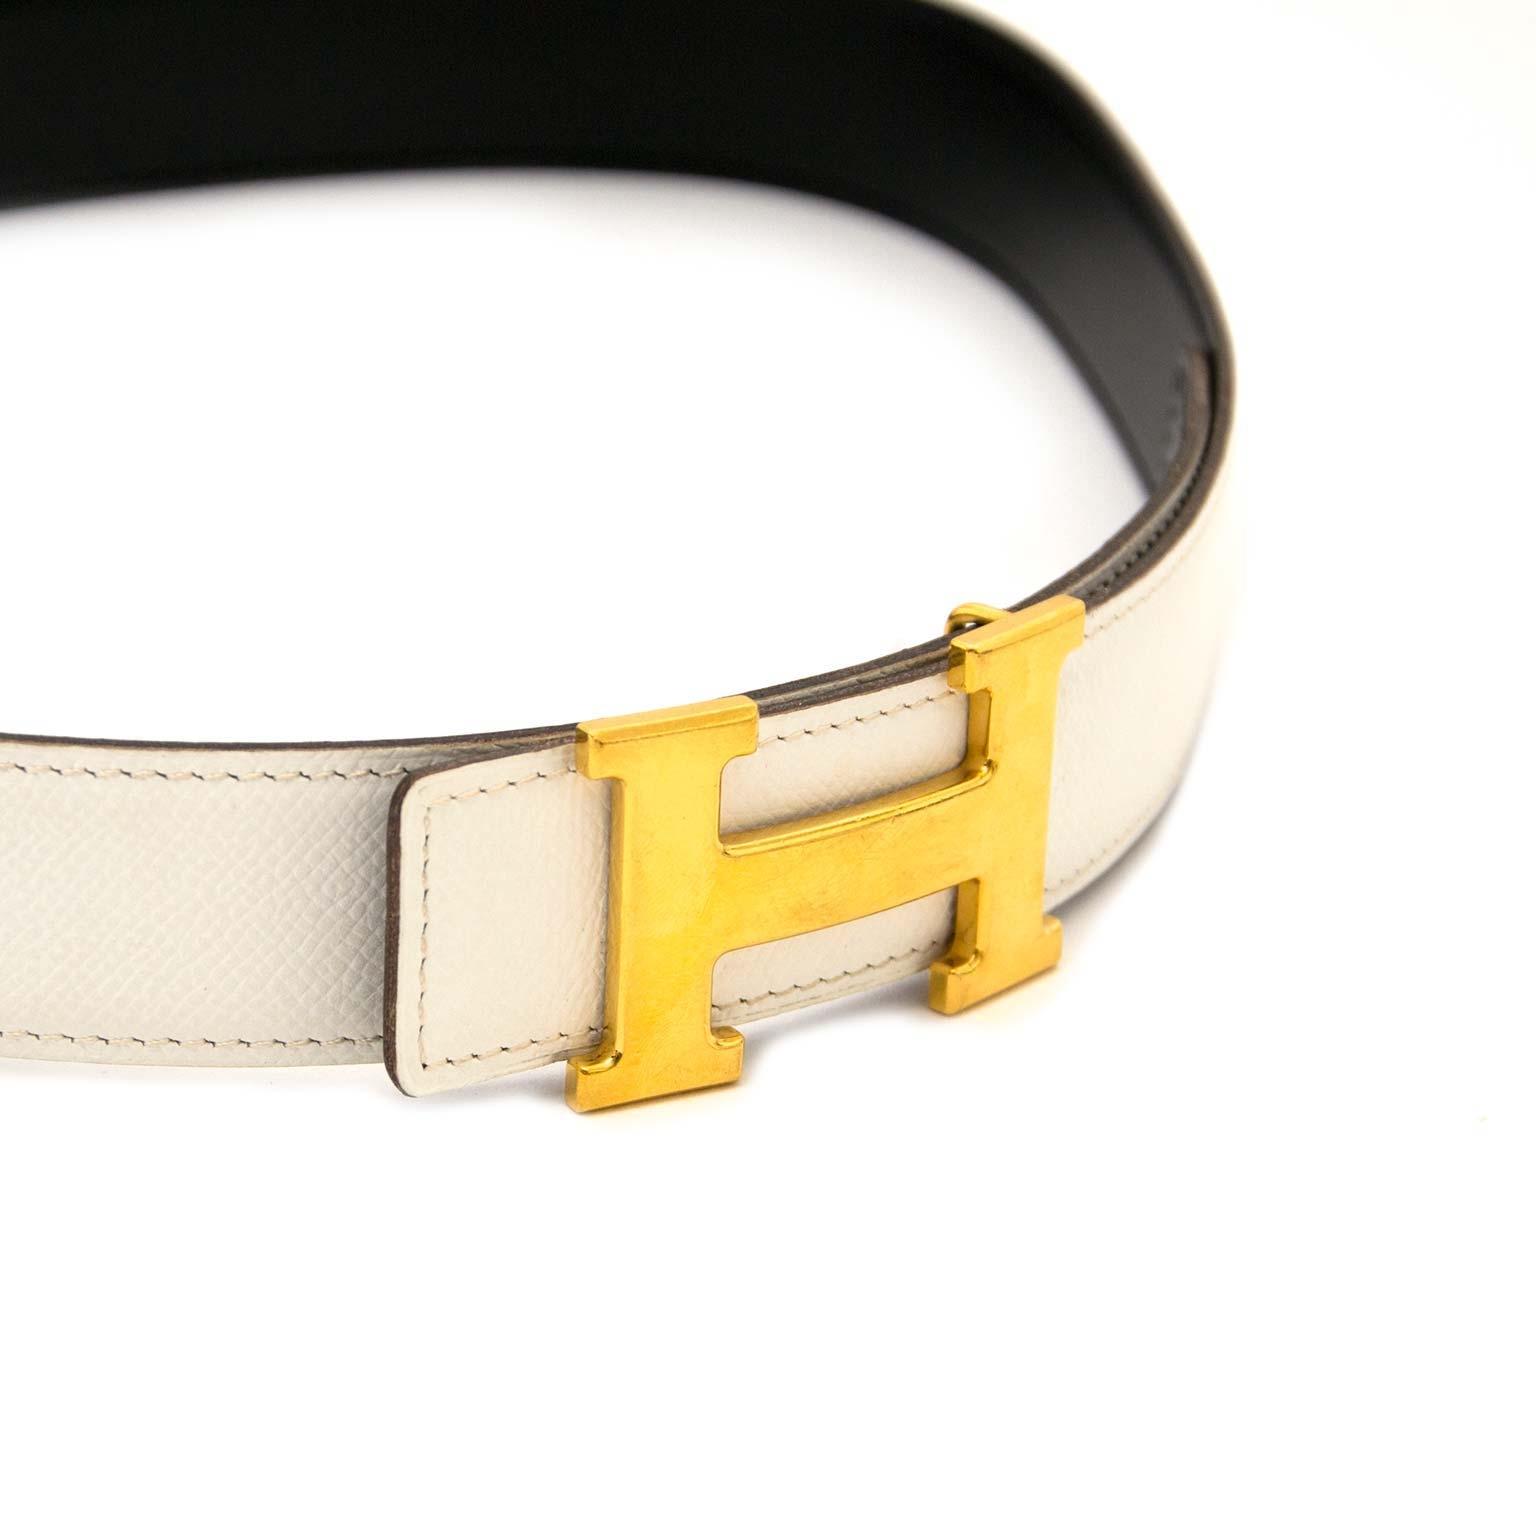 Hermès Reversible White/Black Constance H Belt